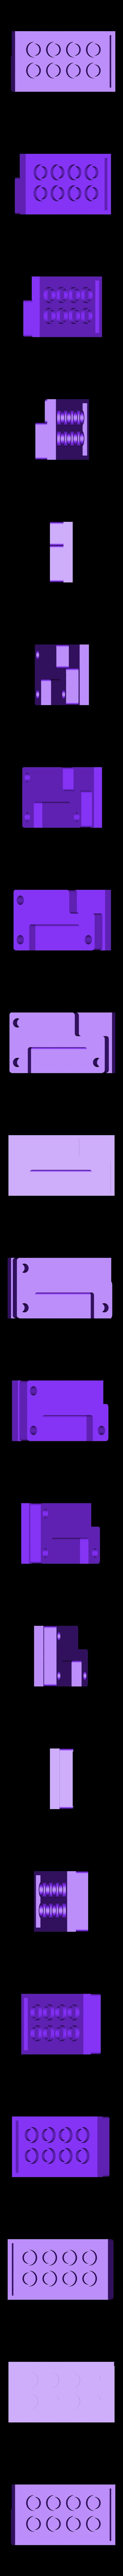 Flotilla_Motor_lego_holder.stl Download free STL file Pimoroni Flotilla lego motor holder • 3D printable object, squiqui